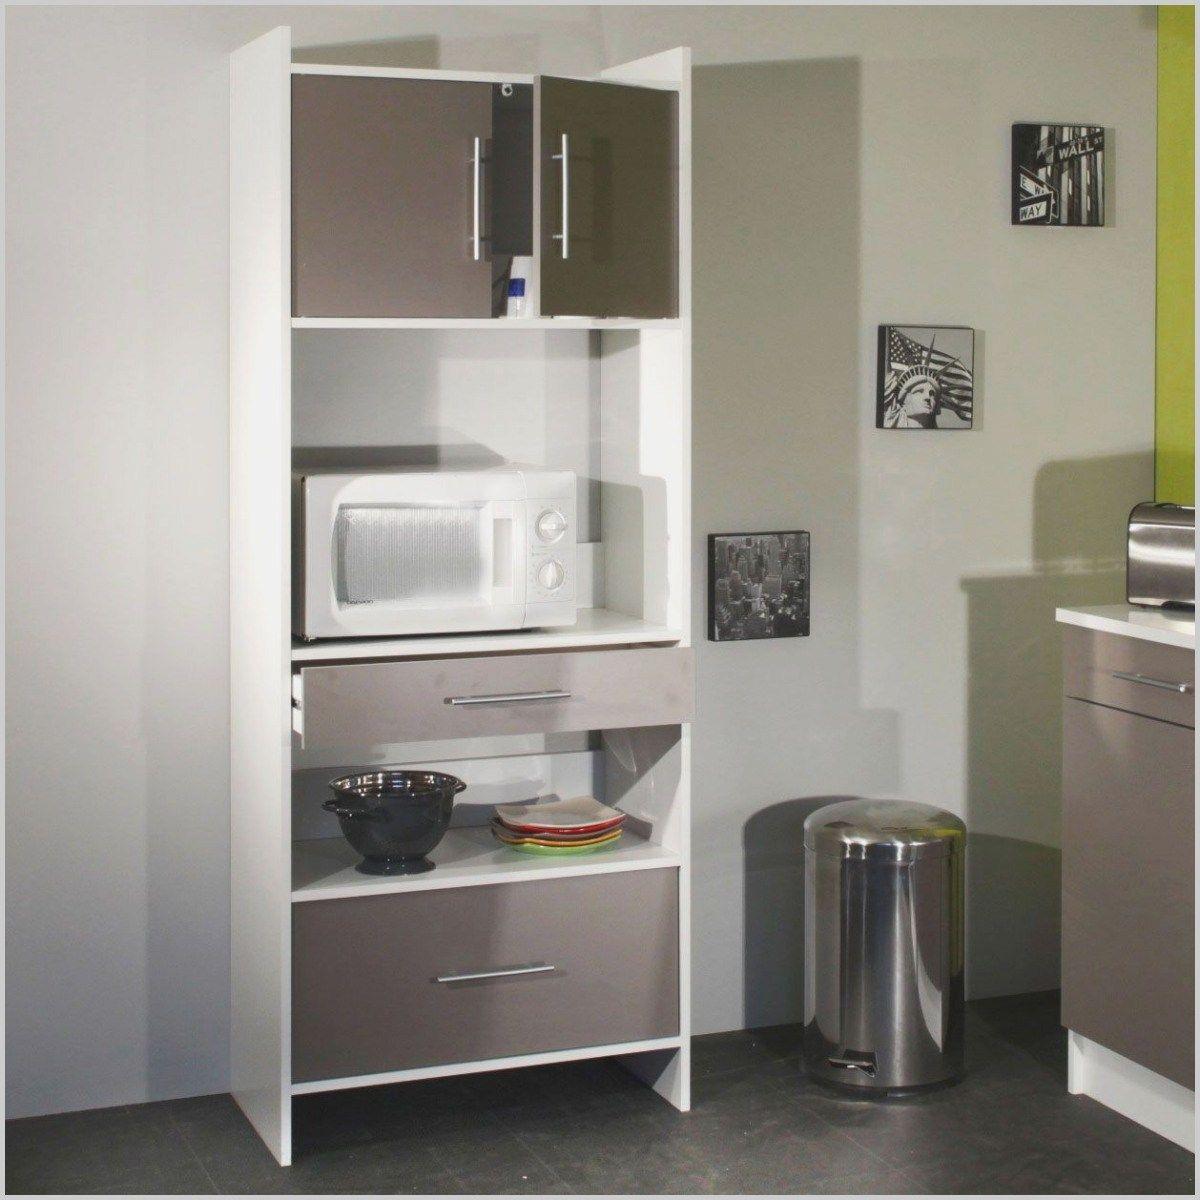 Meilleur Four Micro Onde Encastrable Ikea Home House Design Tall Cabinet Storage